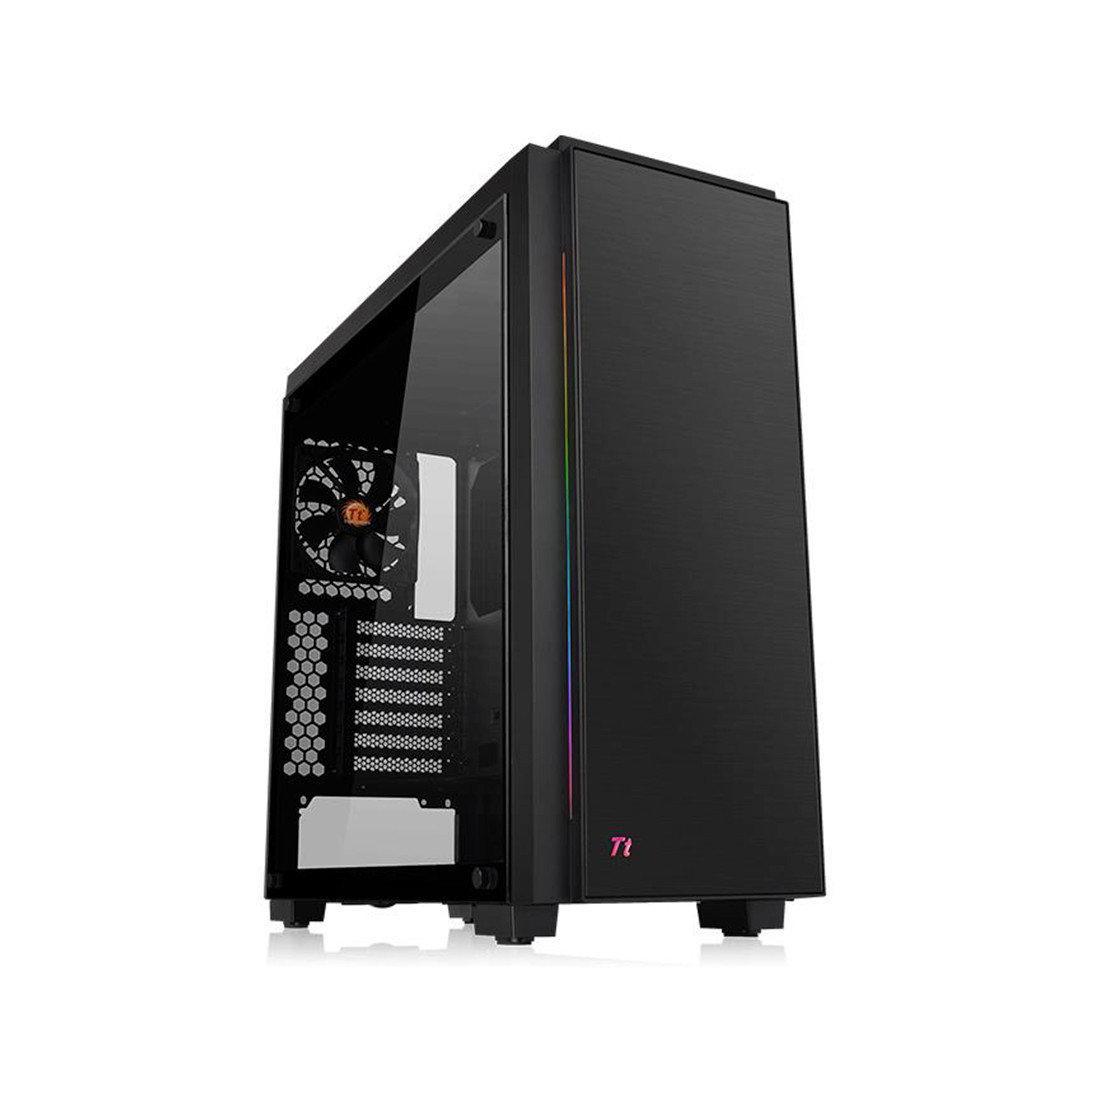 Системный блок Intel Core i5-7400 3.0GHZ/H110/DDR4 4GB/HDD 500GB/450W